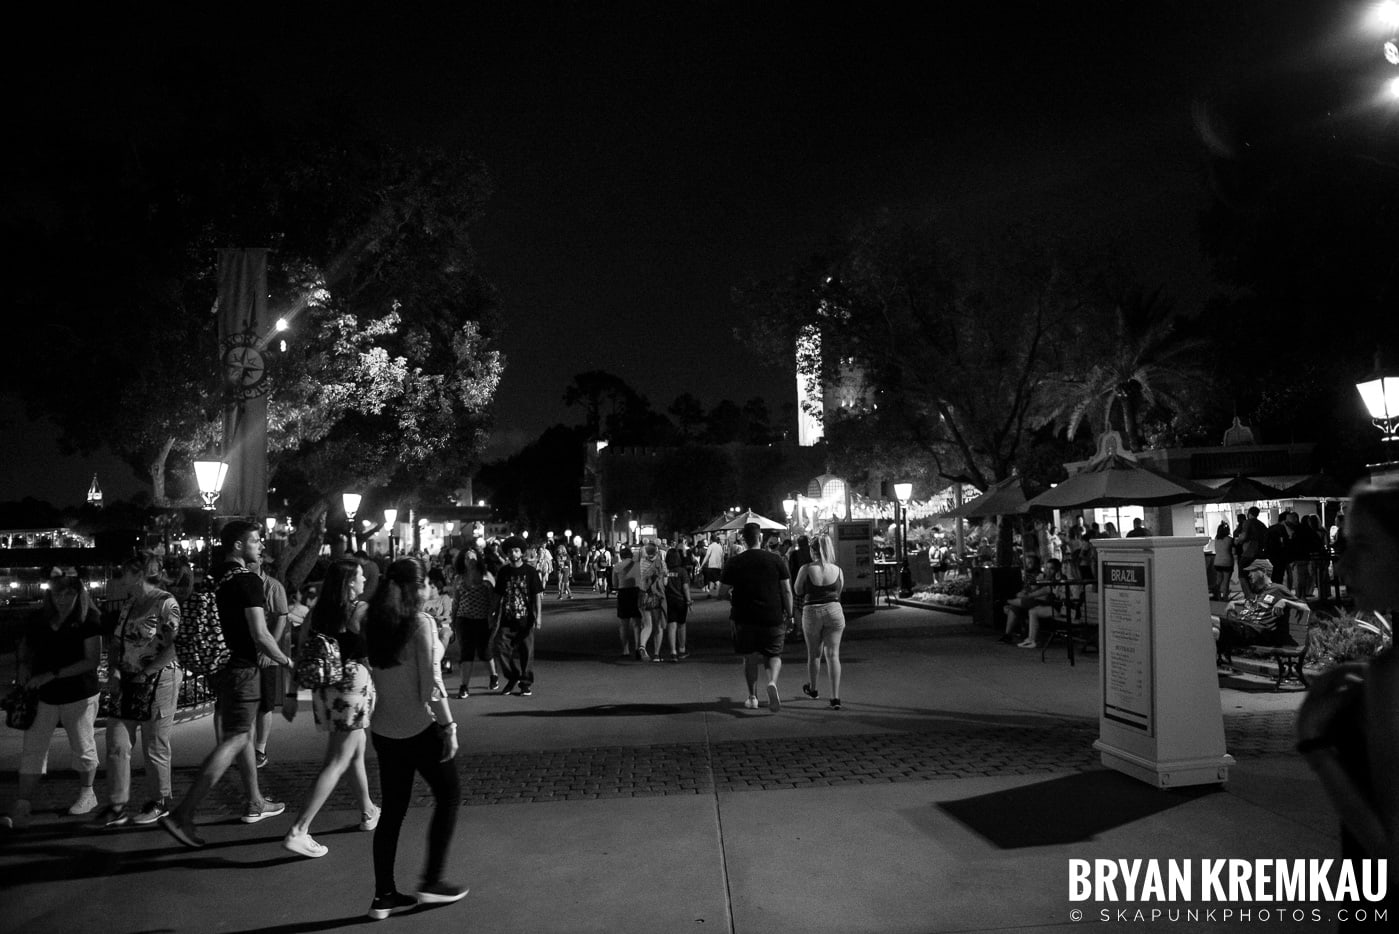 Walt Disney World Vacation: Day 4 (Epcot) October 2nd 2019 (13)